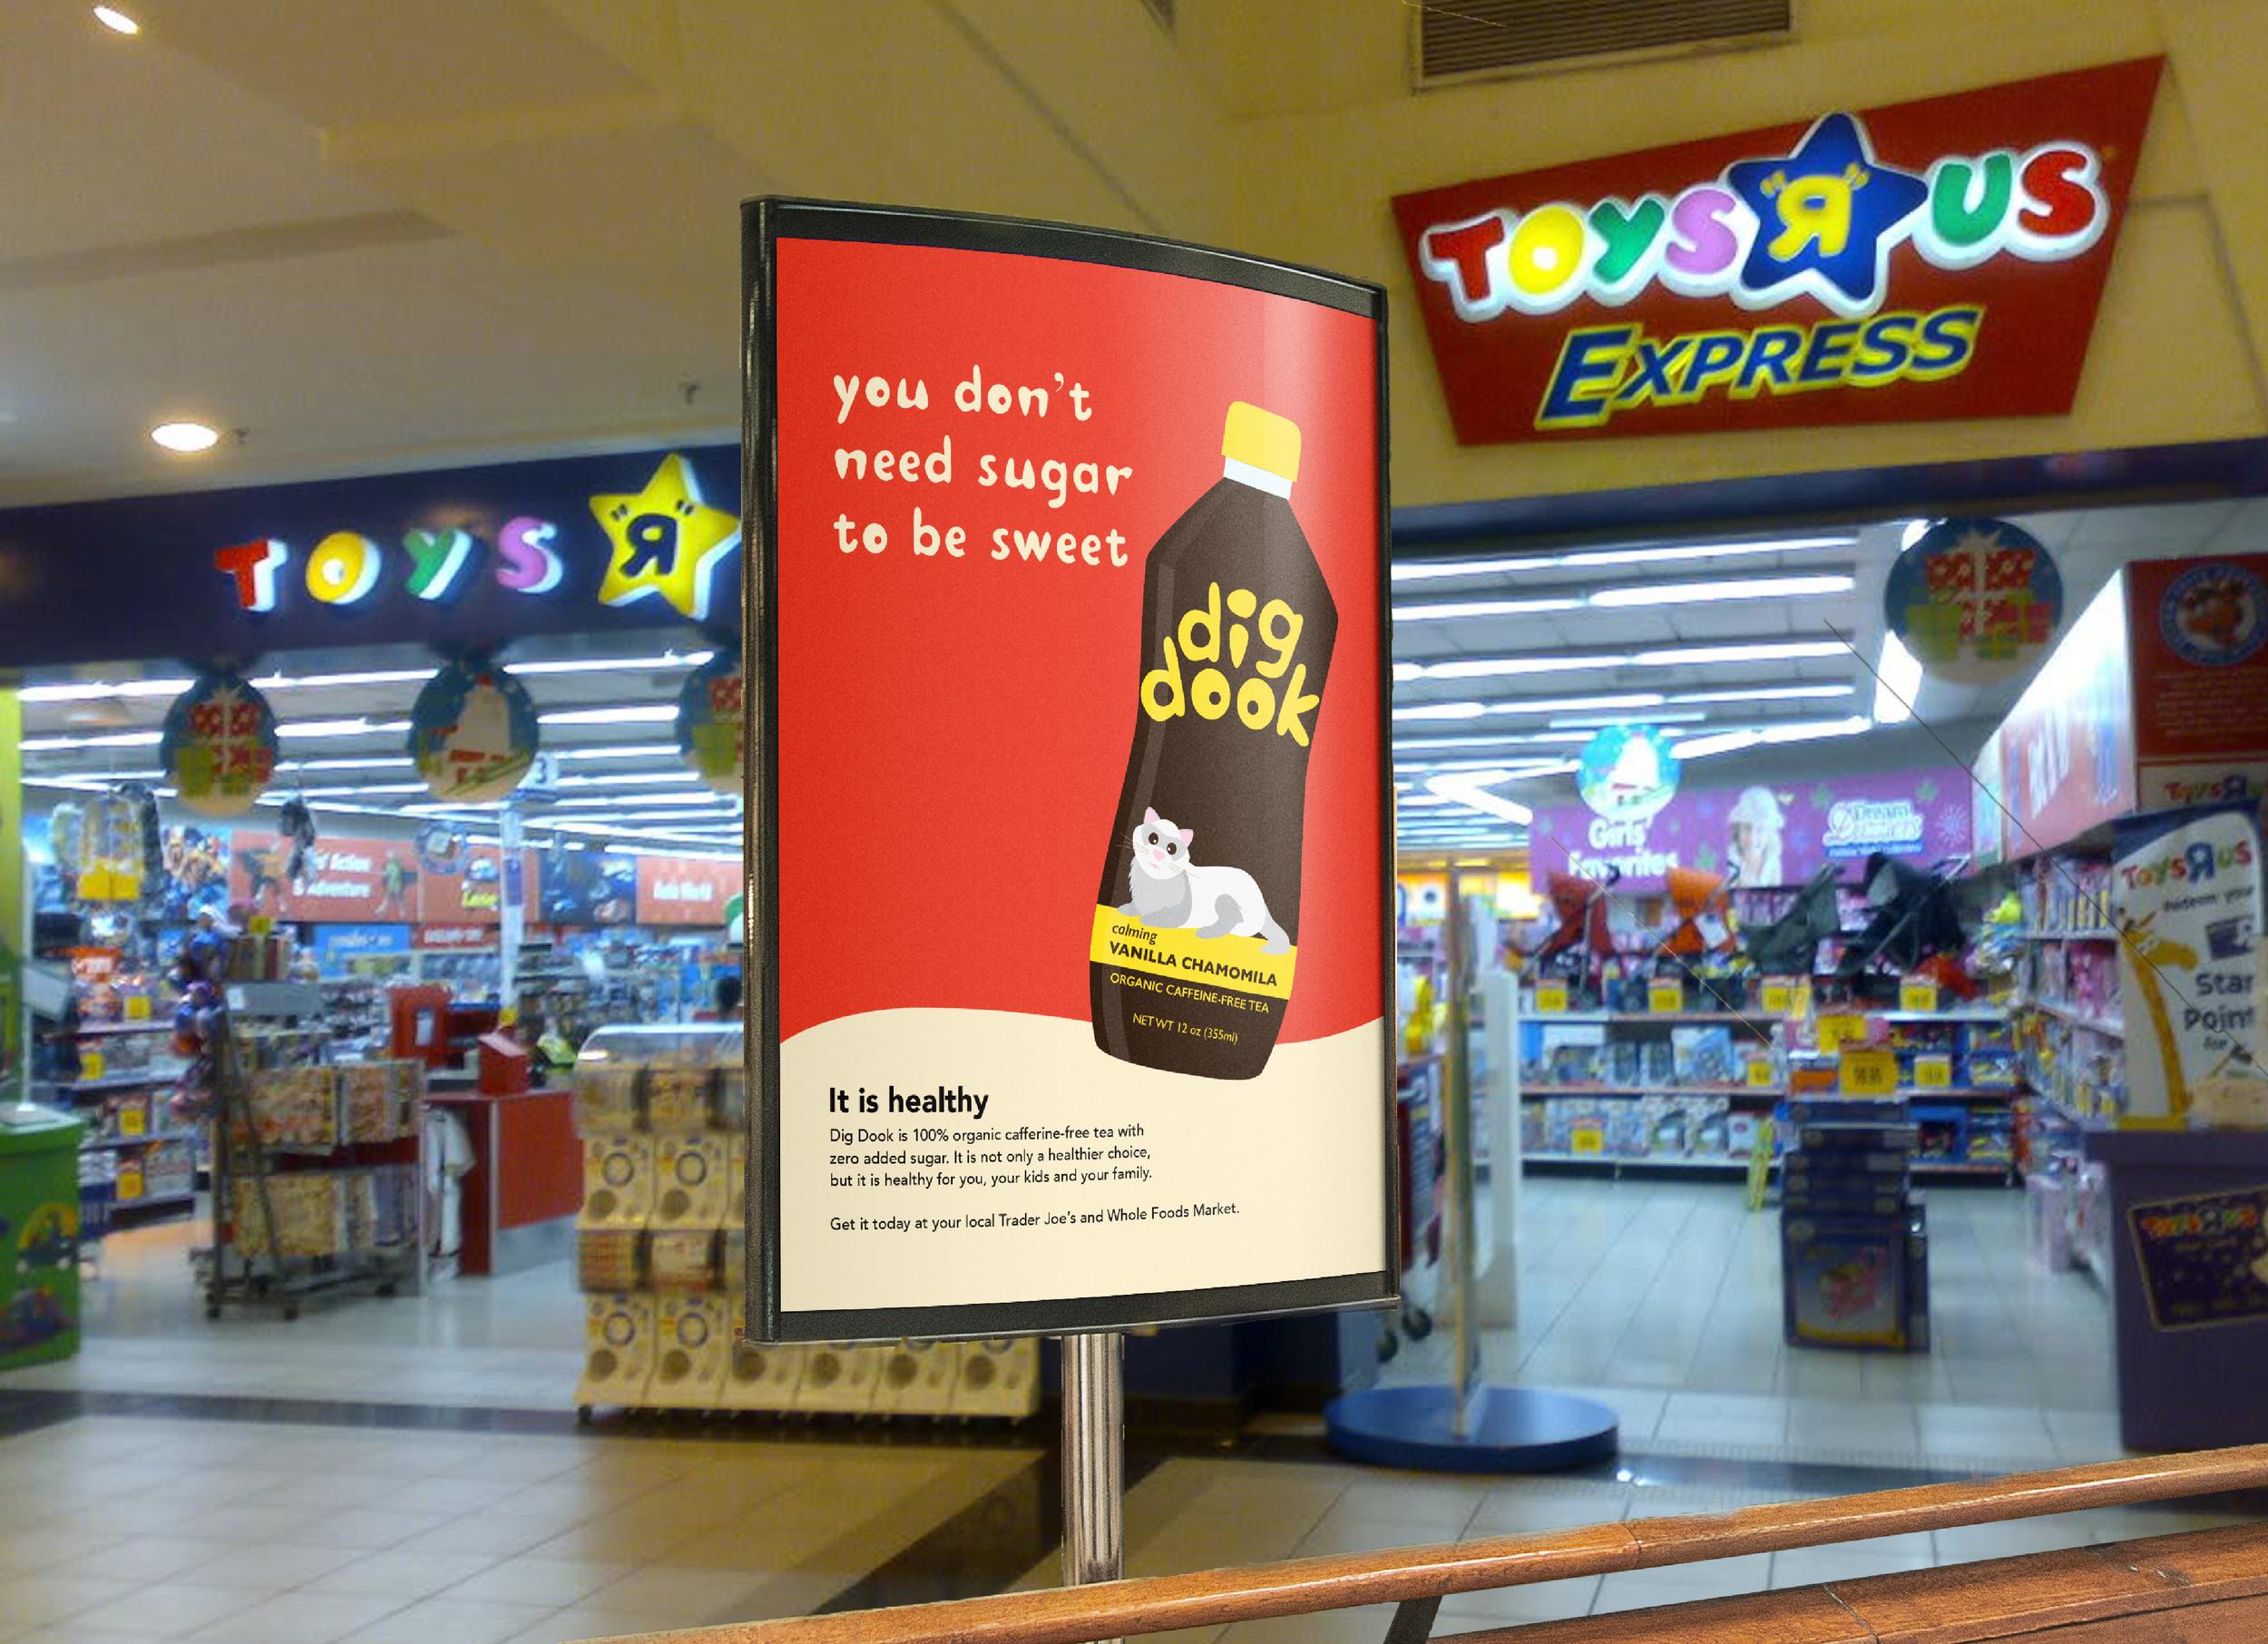 dig_dook_mall_ad.jpg